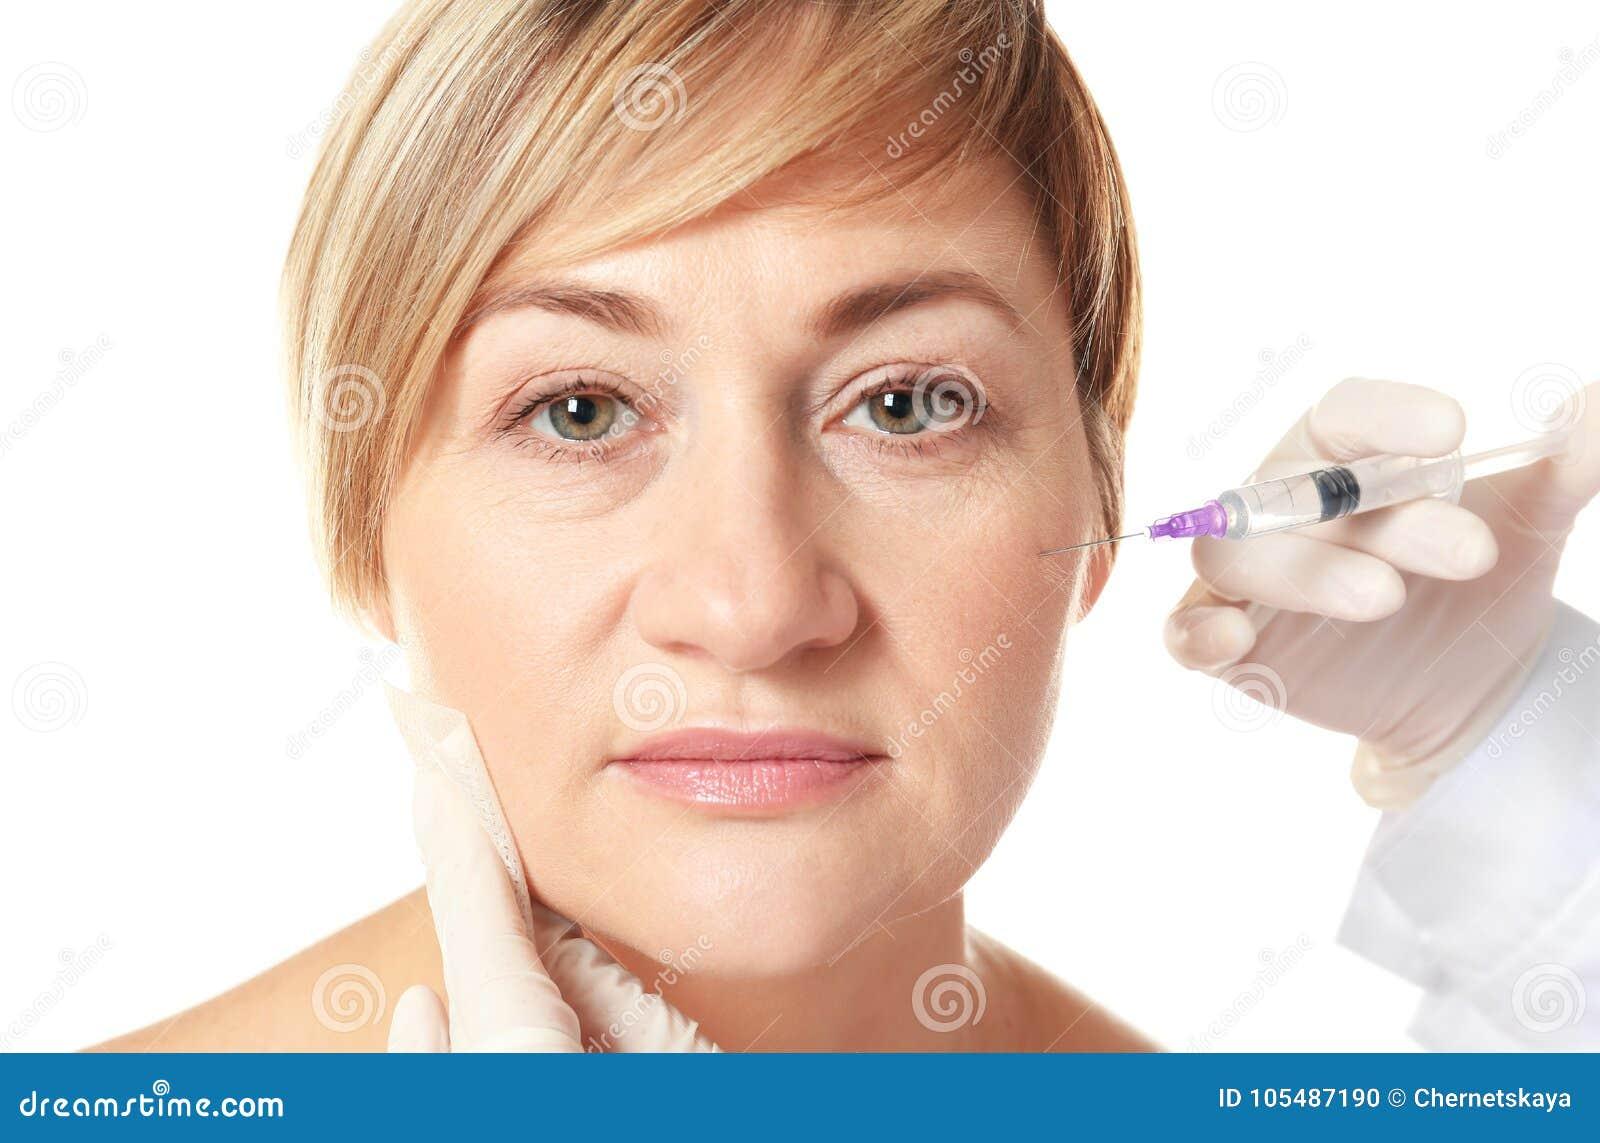 Are facial rejuvenation procedure